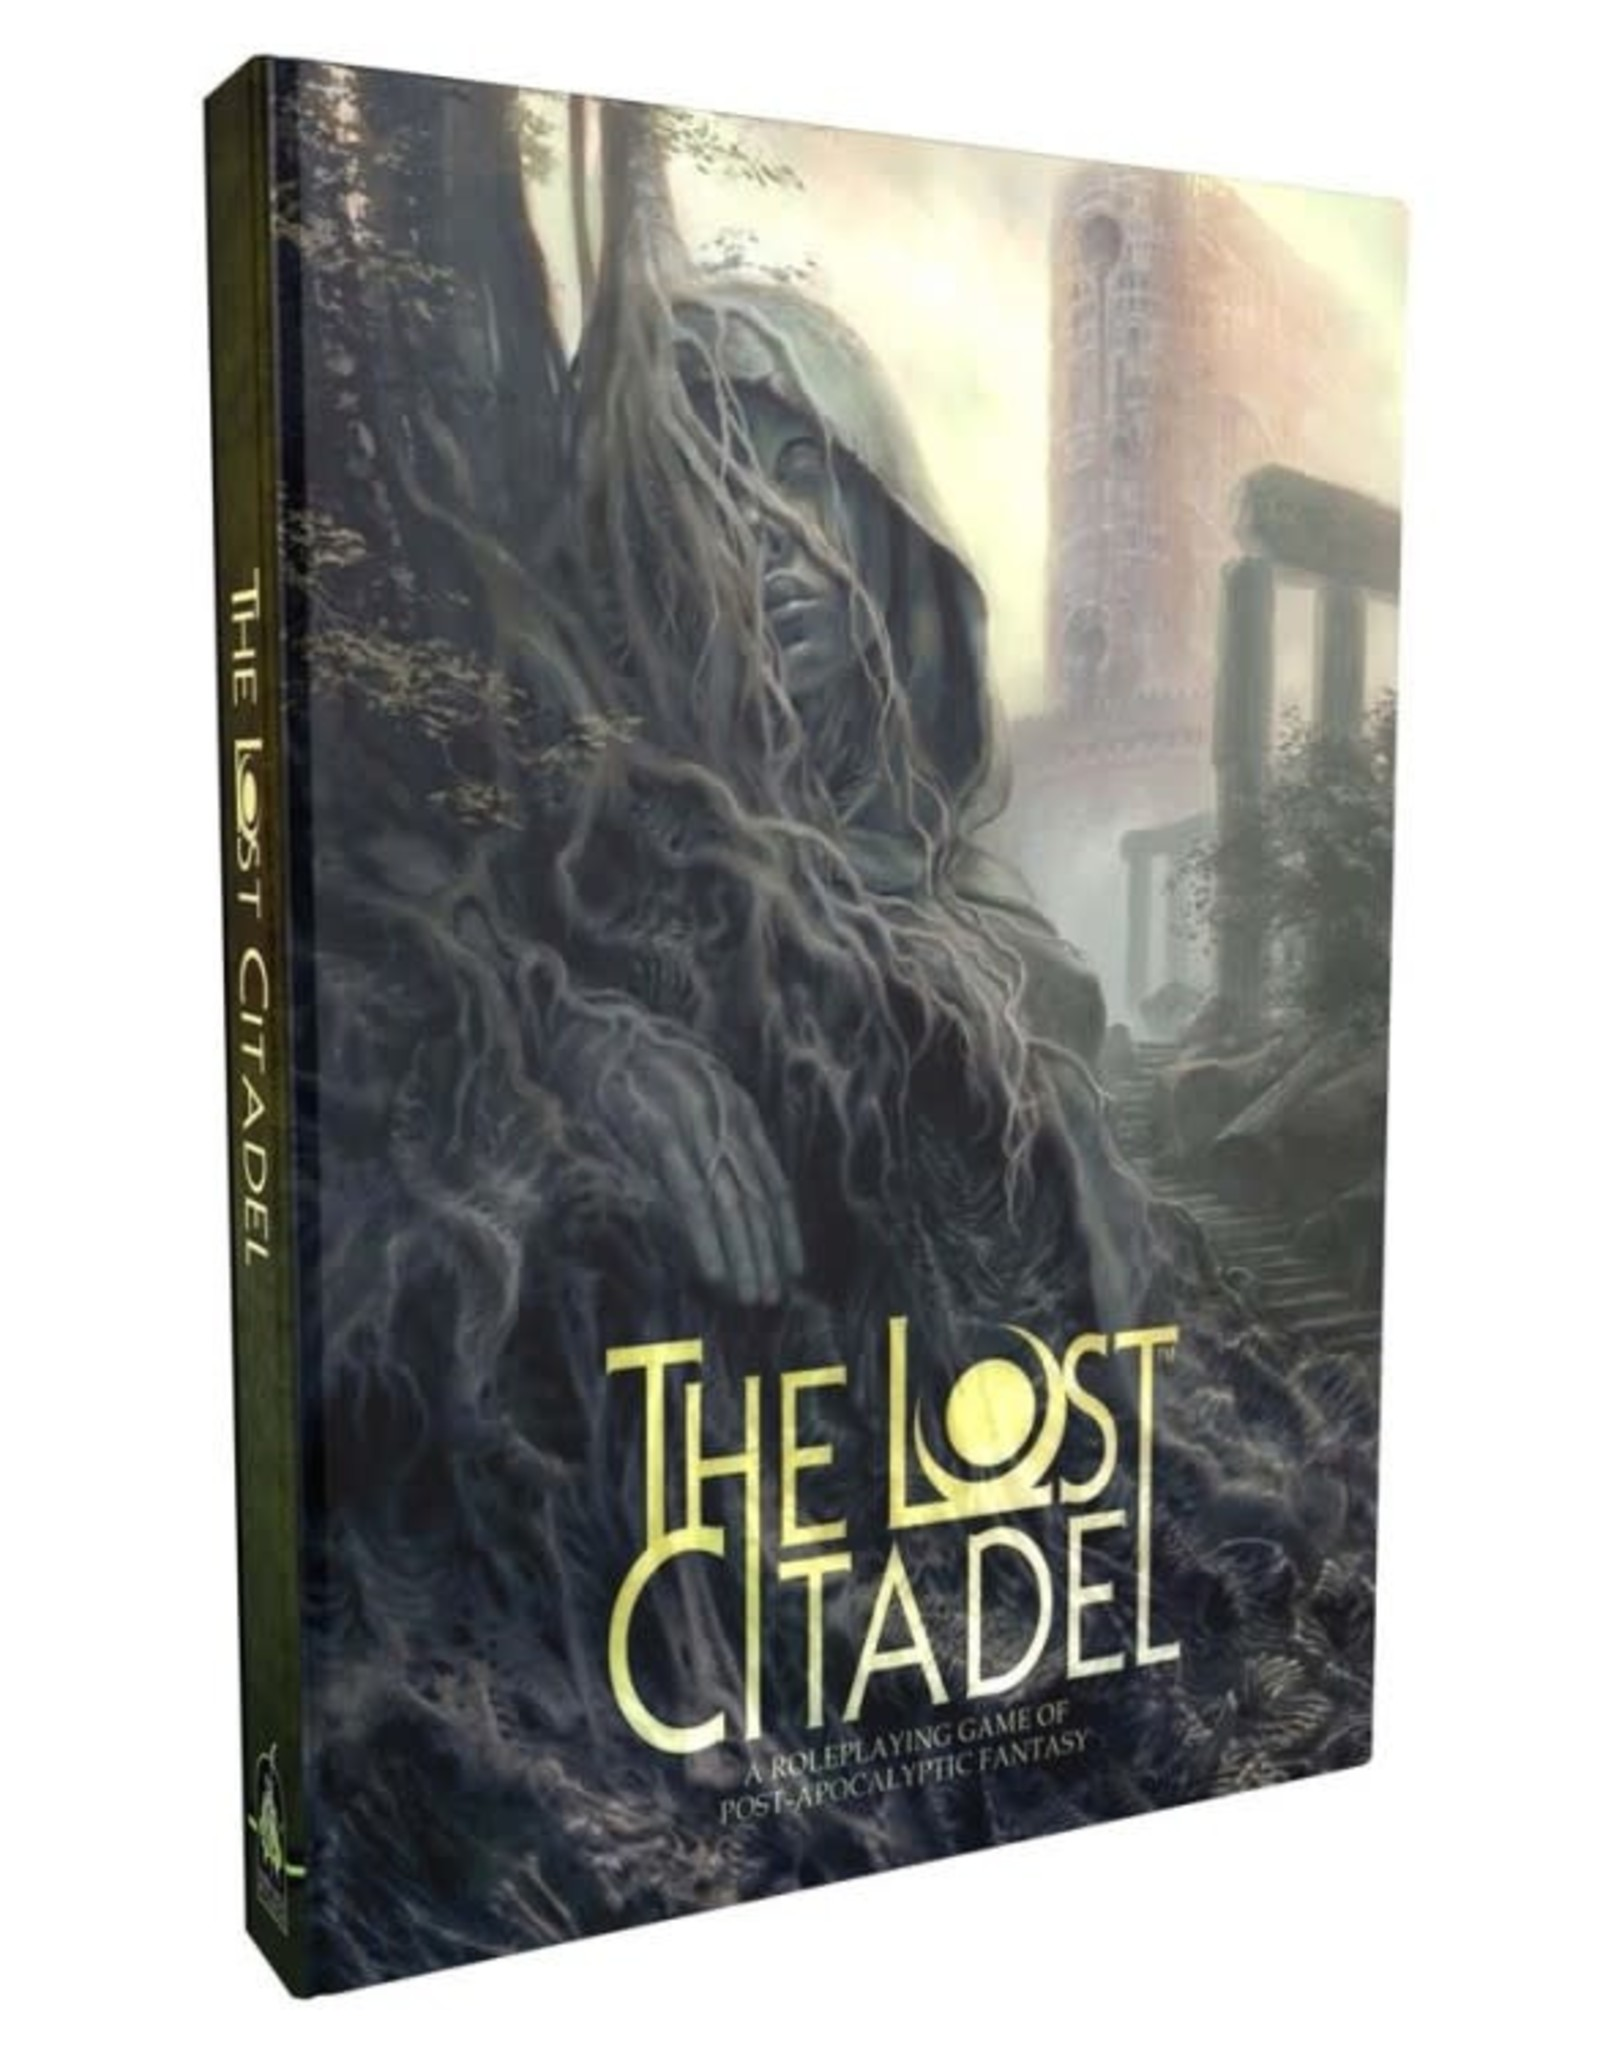 Green Ronin Publishing 5E: Lost Citadel RPG